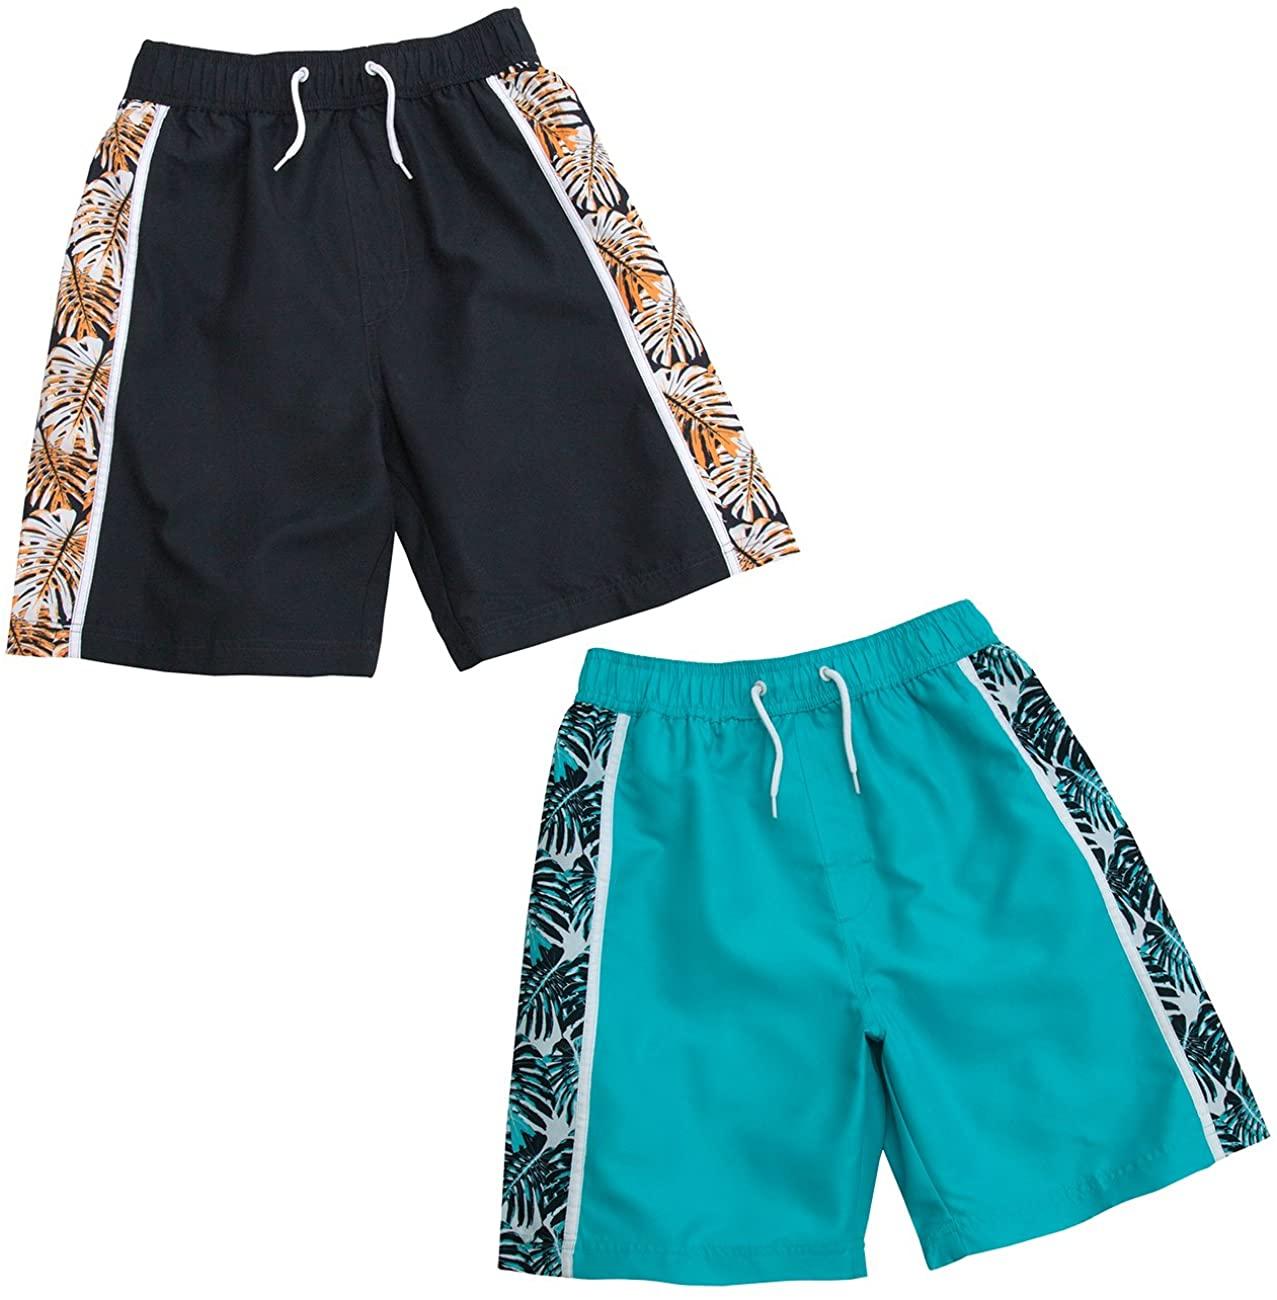 Cargo Bay Infant Boys Bermuda Swim Shorts Perfect for Summer Beach Holidays